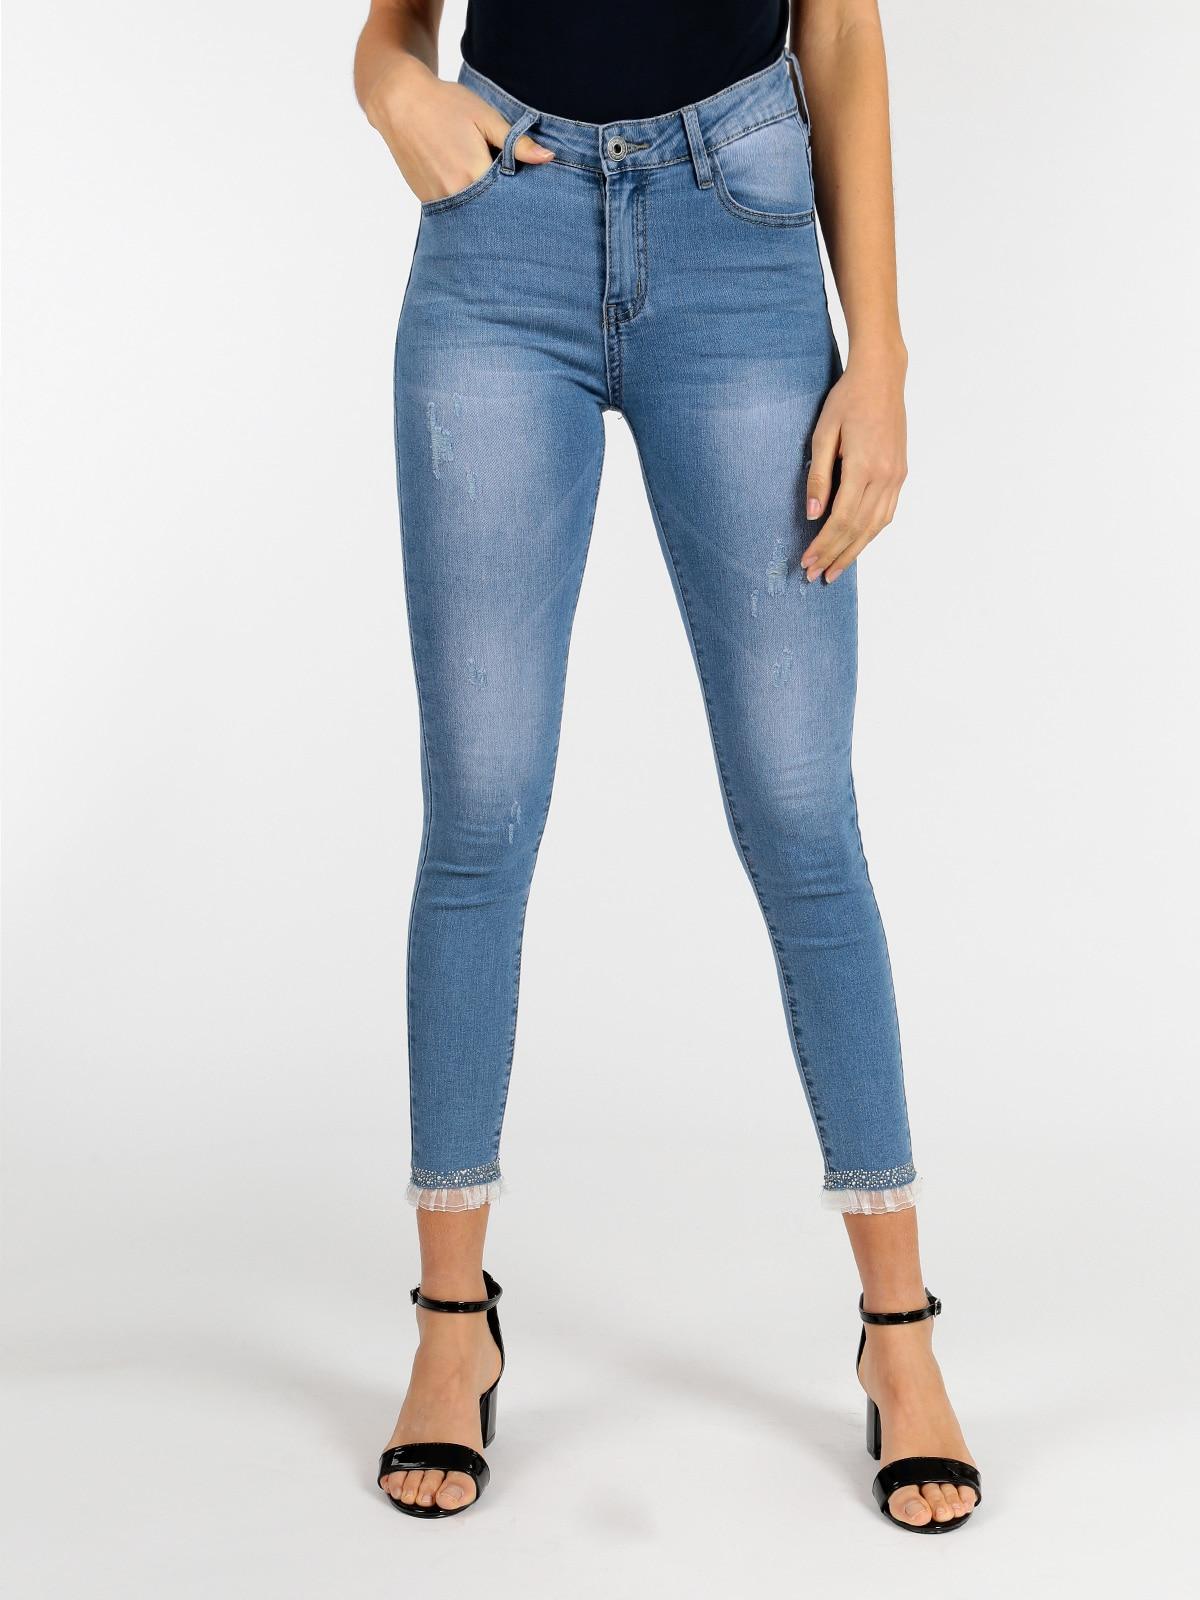 FIONINA JEANS Skinny Jeans With Rhinestones